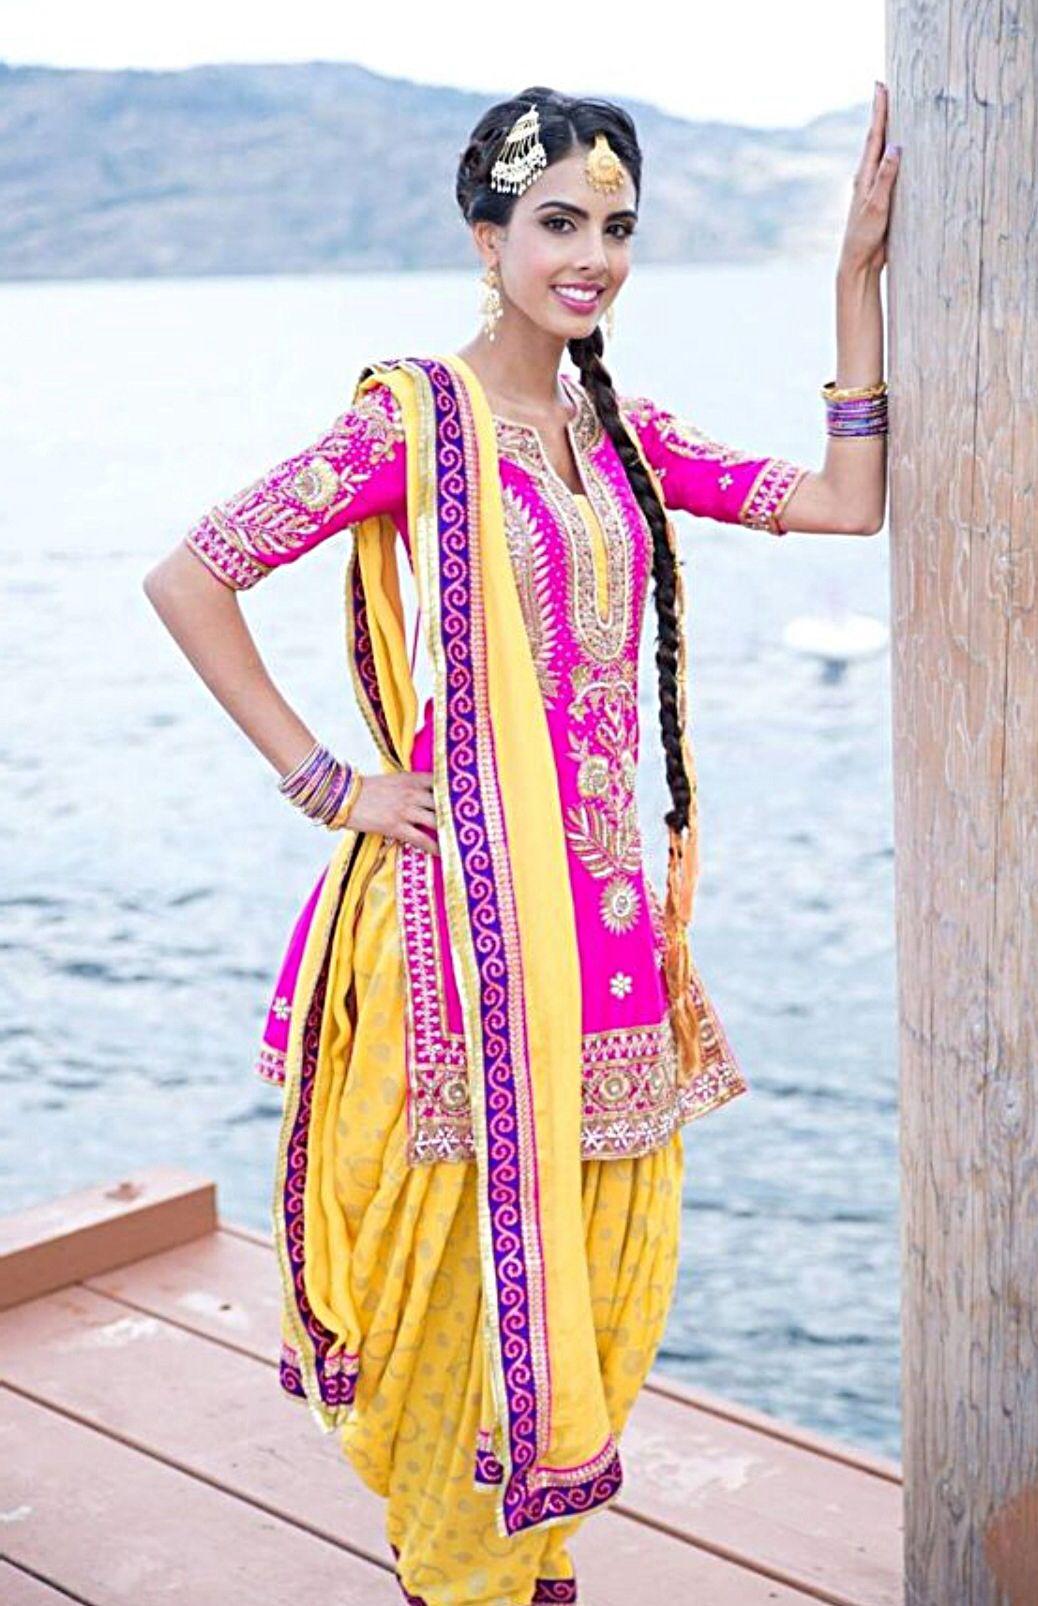 5 New Style of Punjabi Suits Made by Punjabi Women | Punjabi suits Patiala and Indian fashion